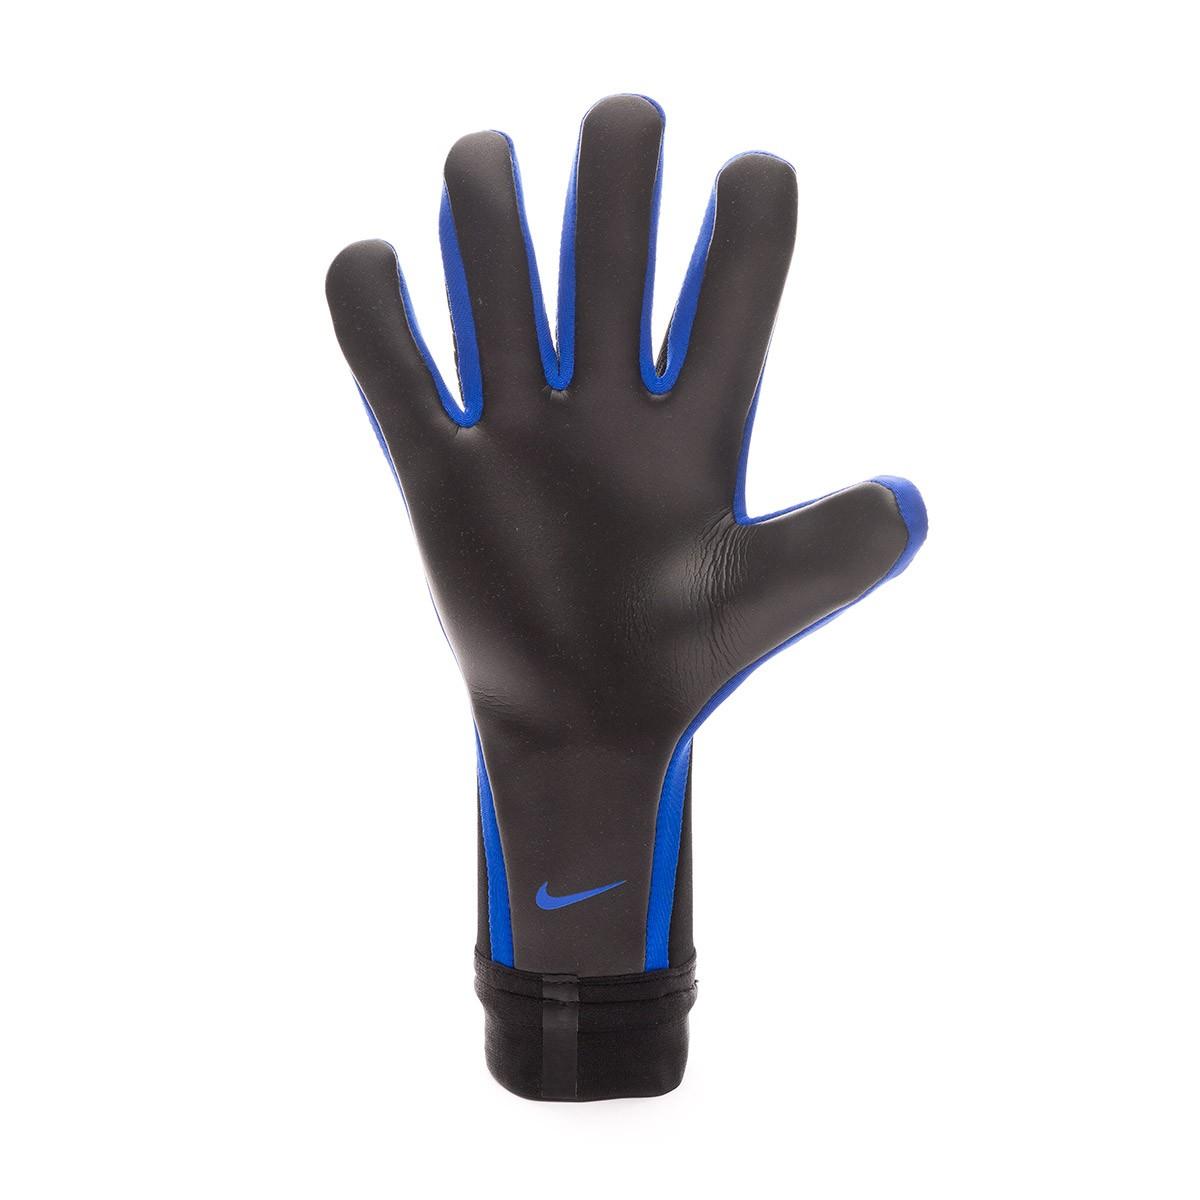 Anuncio perjudicar compartir  Glove Nike Mercurial Touch Victory Black-Metallic silver-Racer blue -  Football store Fútbol Emotion